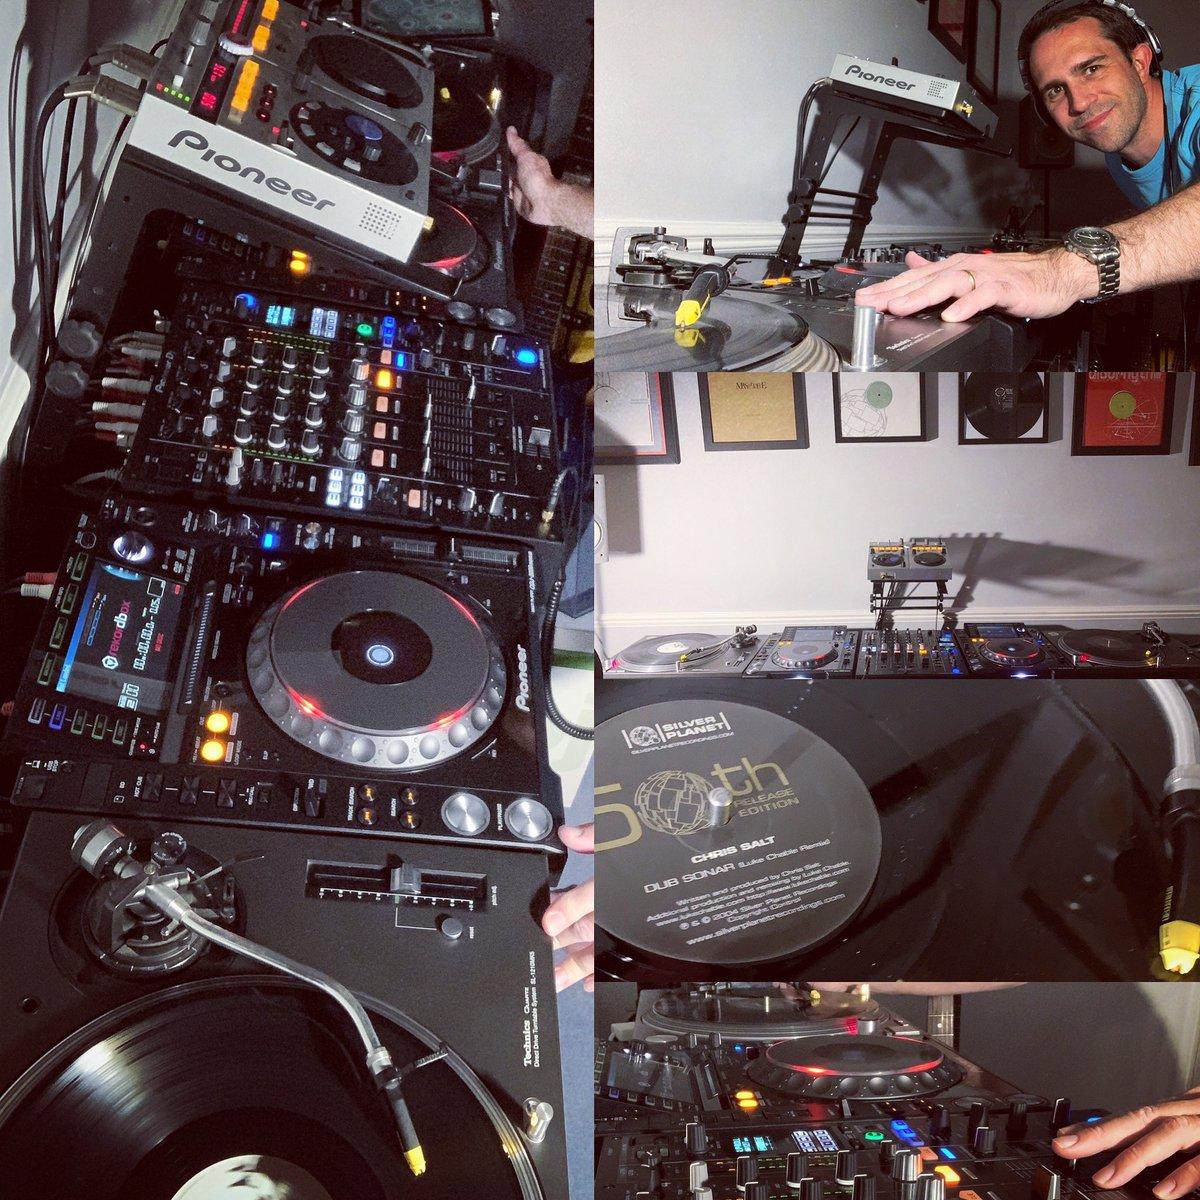 Fun little vinyl mix just now!  #techno #progressive #vinylpic.twitter.com/WXQHOiyprd